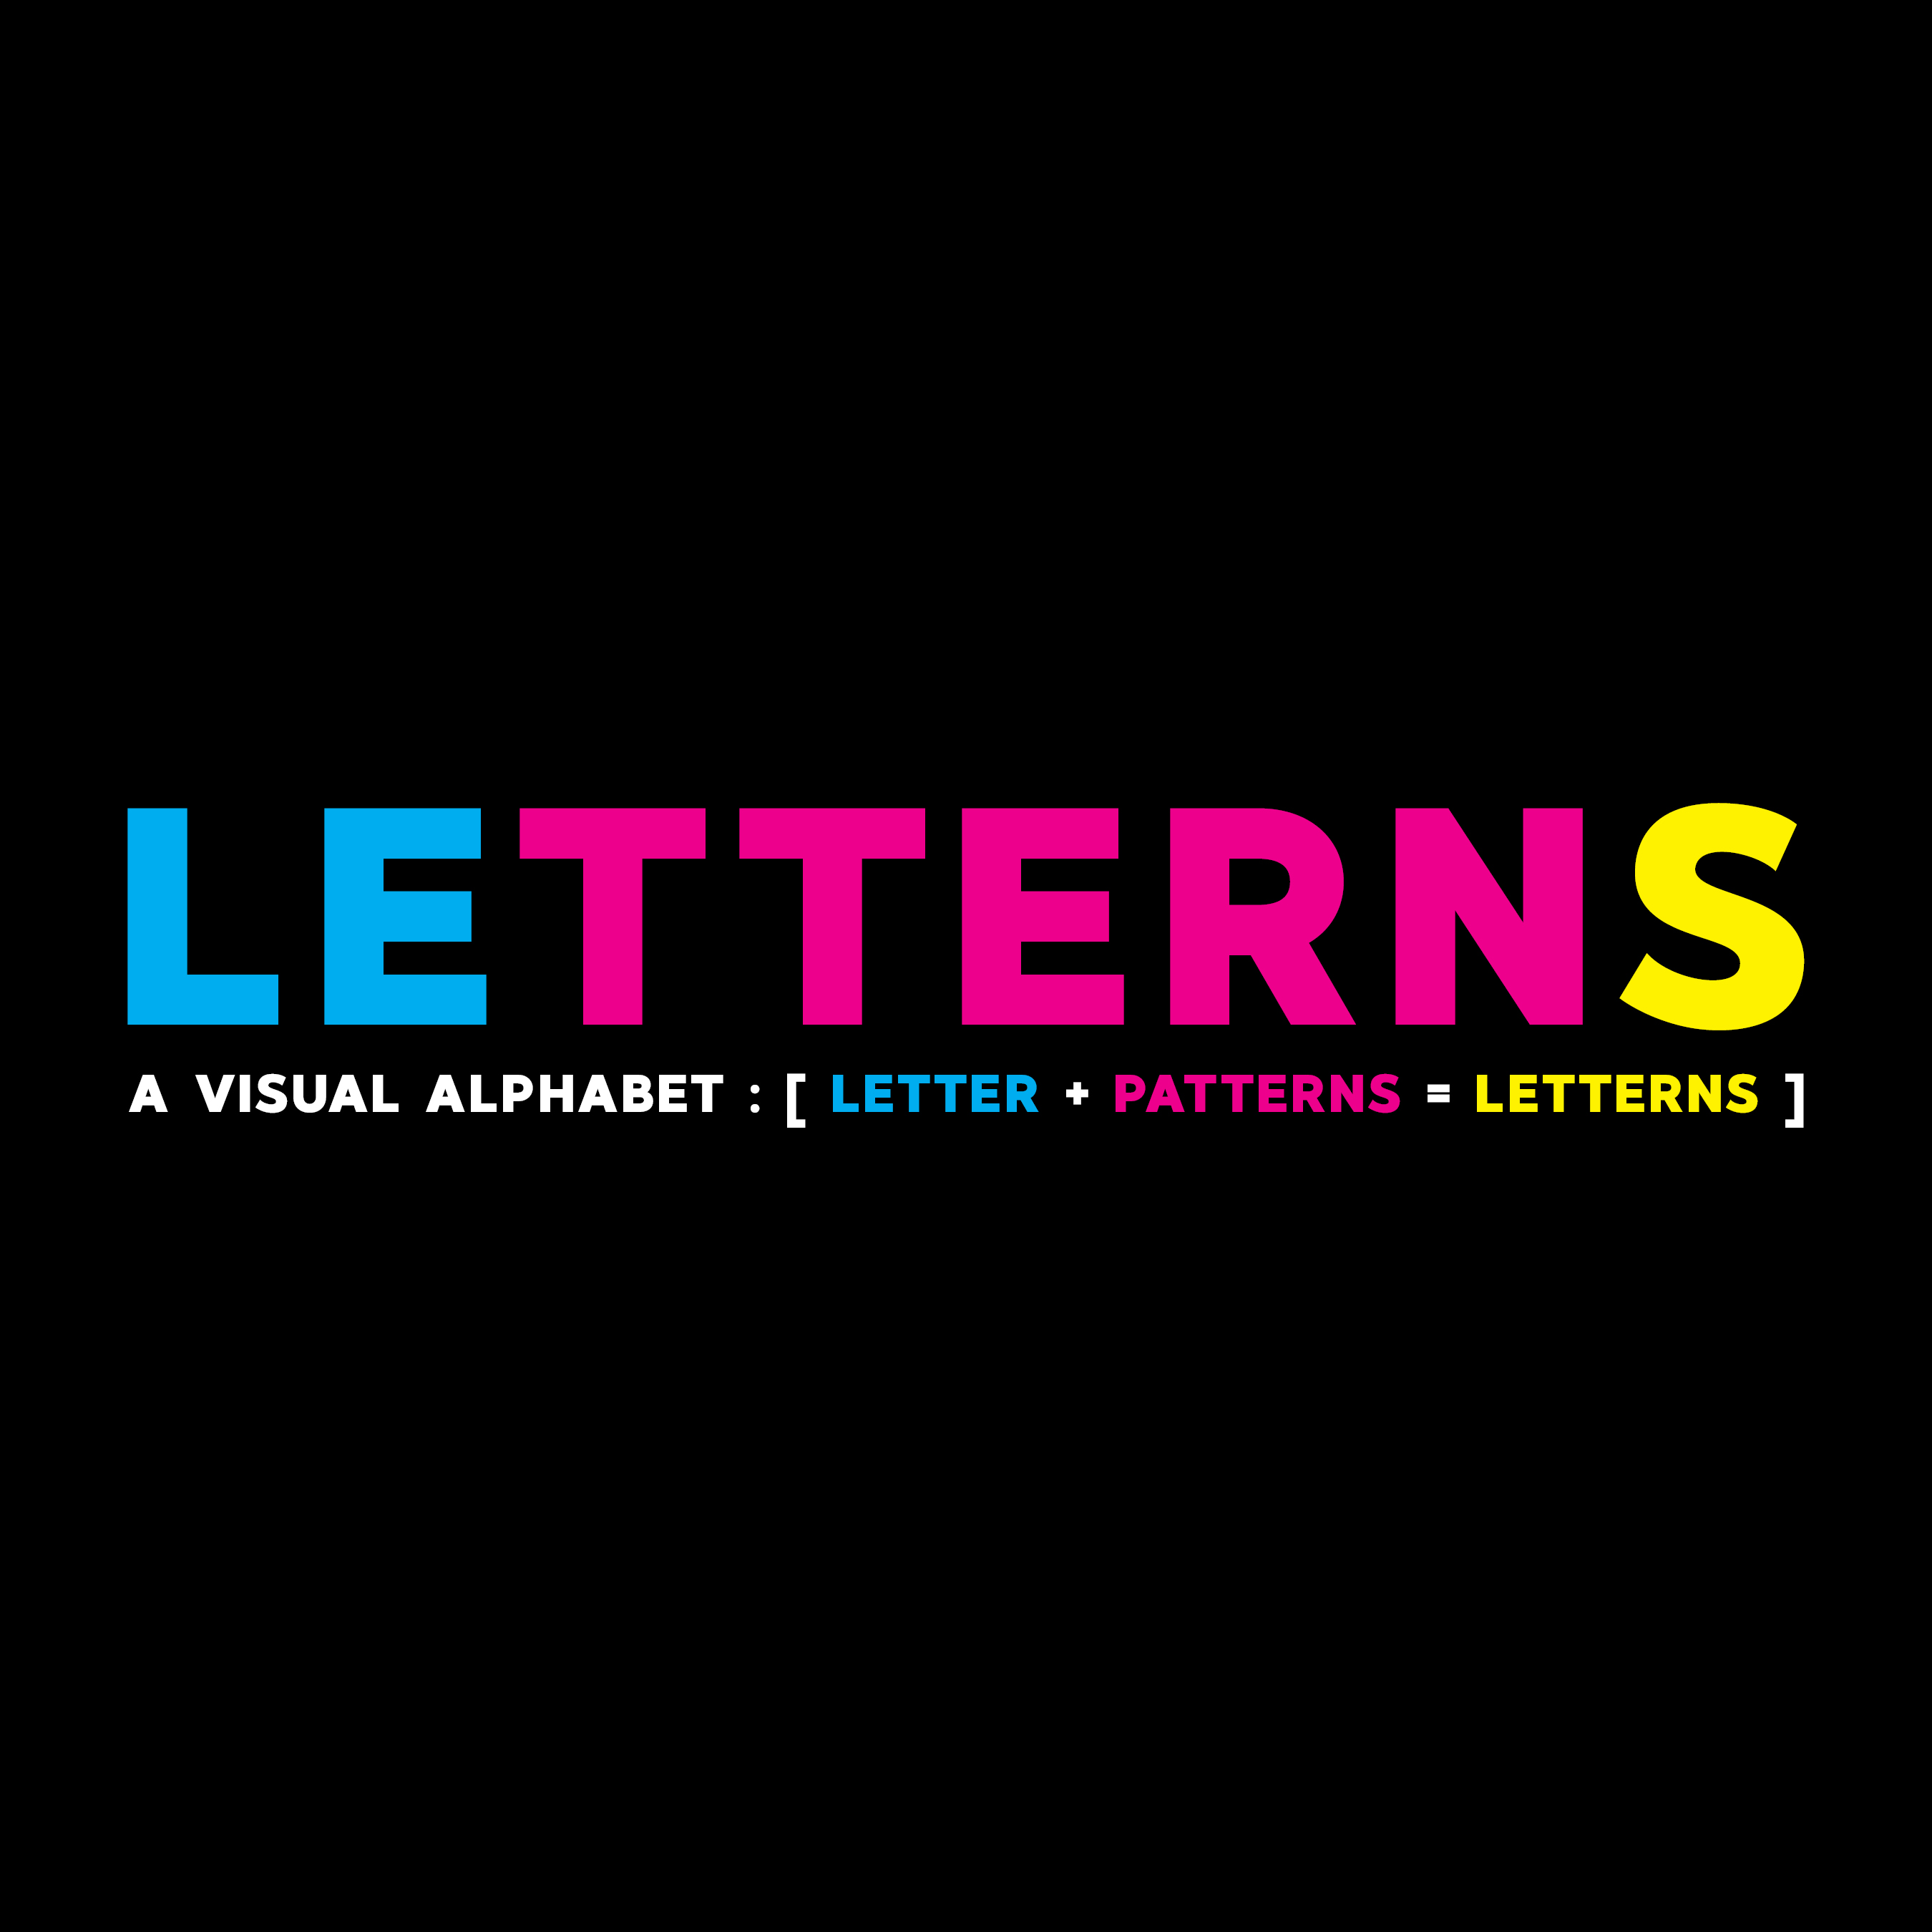 Letterns